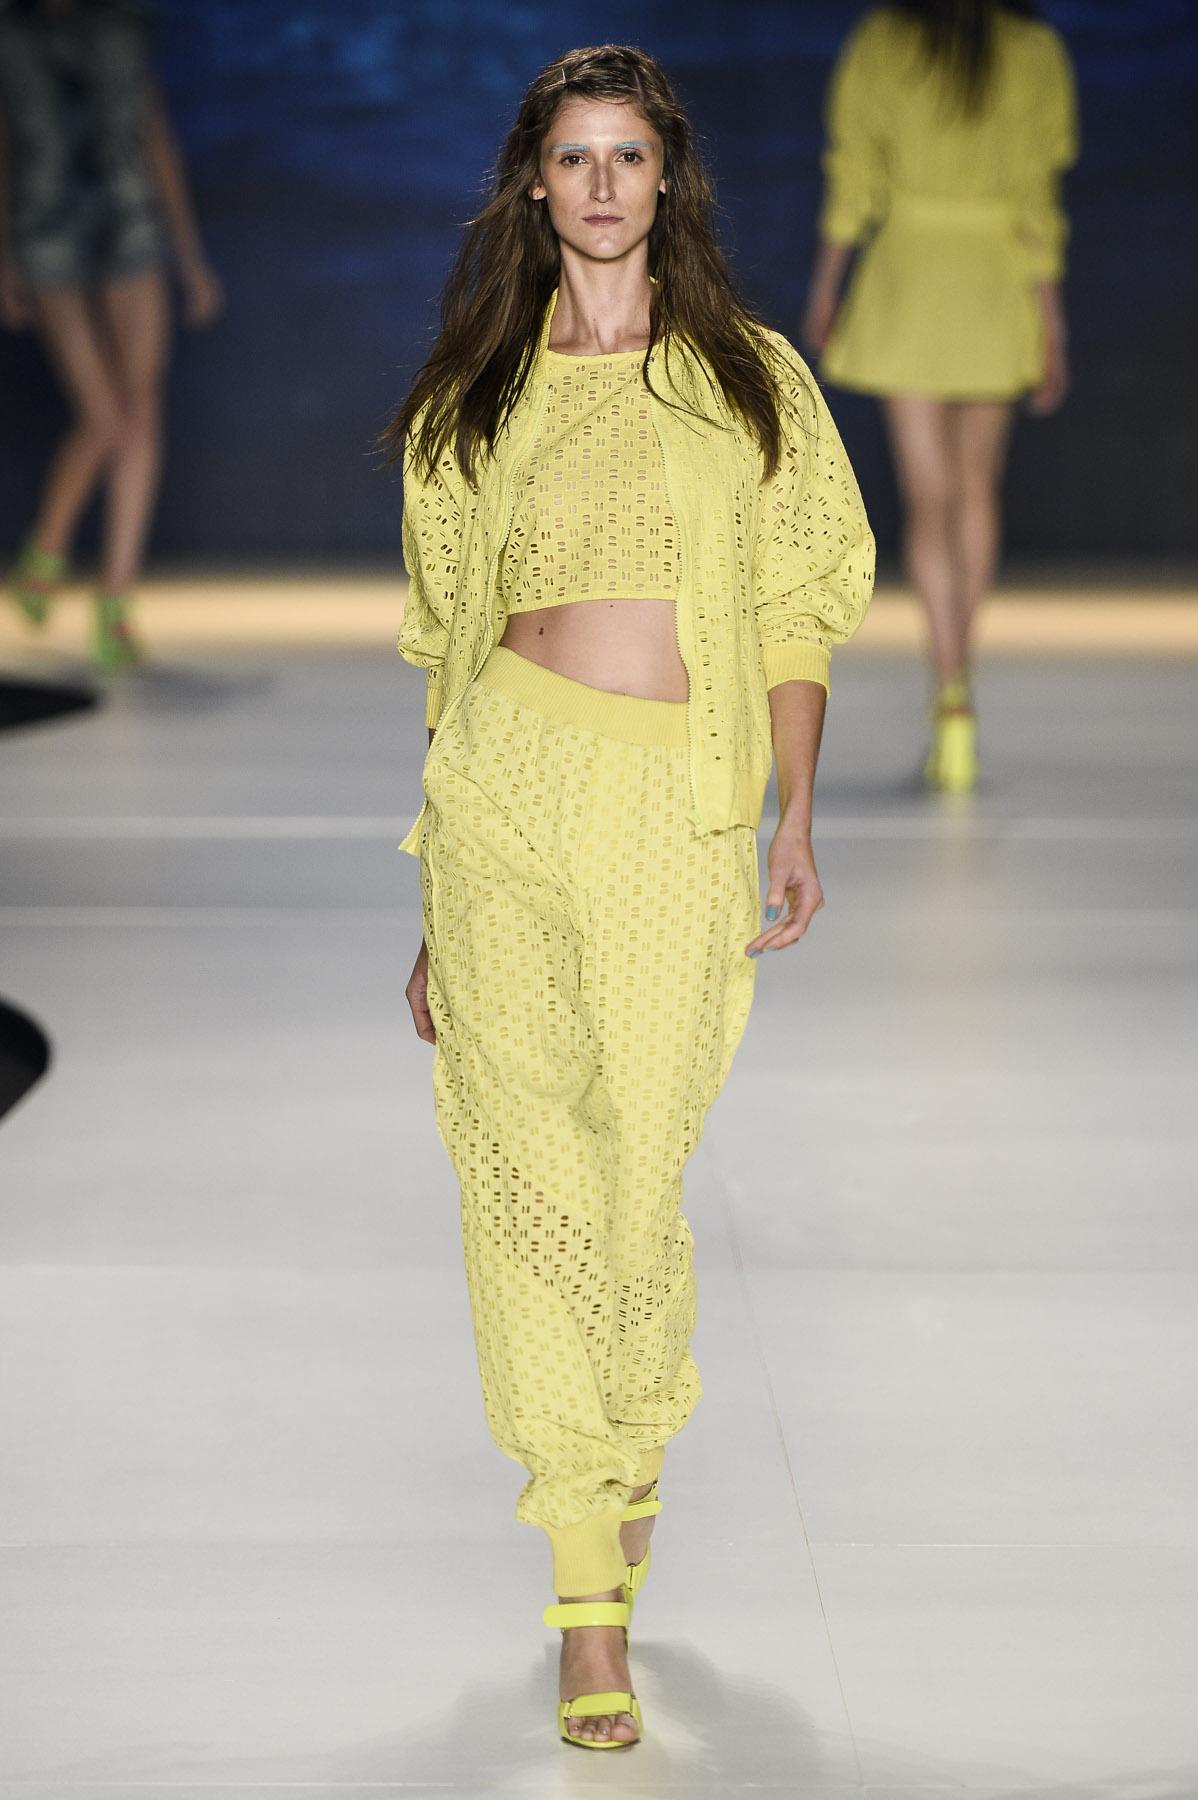 Cole O Coca Cola Clothing Fashion Rio Ver O 2014 Rtw Desfiles Ffw